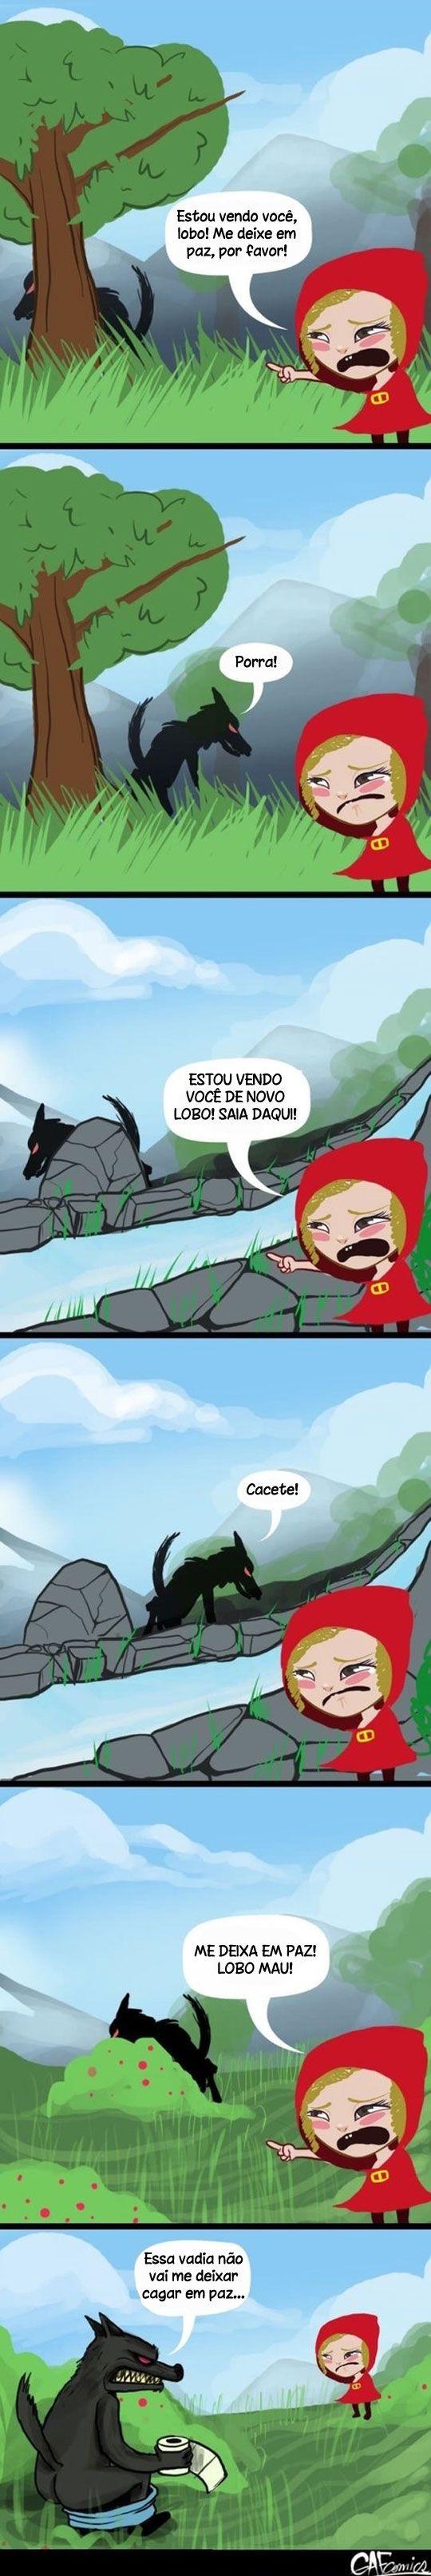 #Lobo: